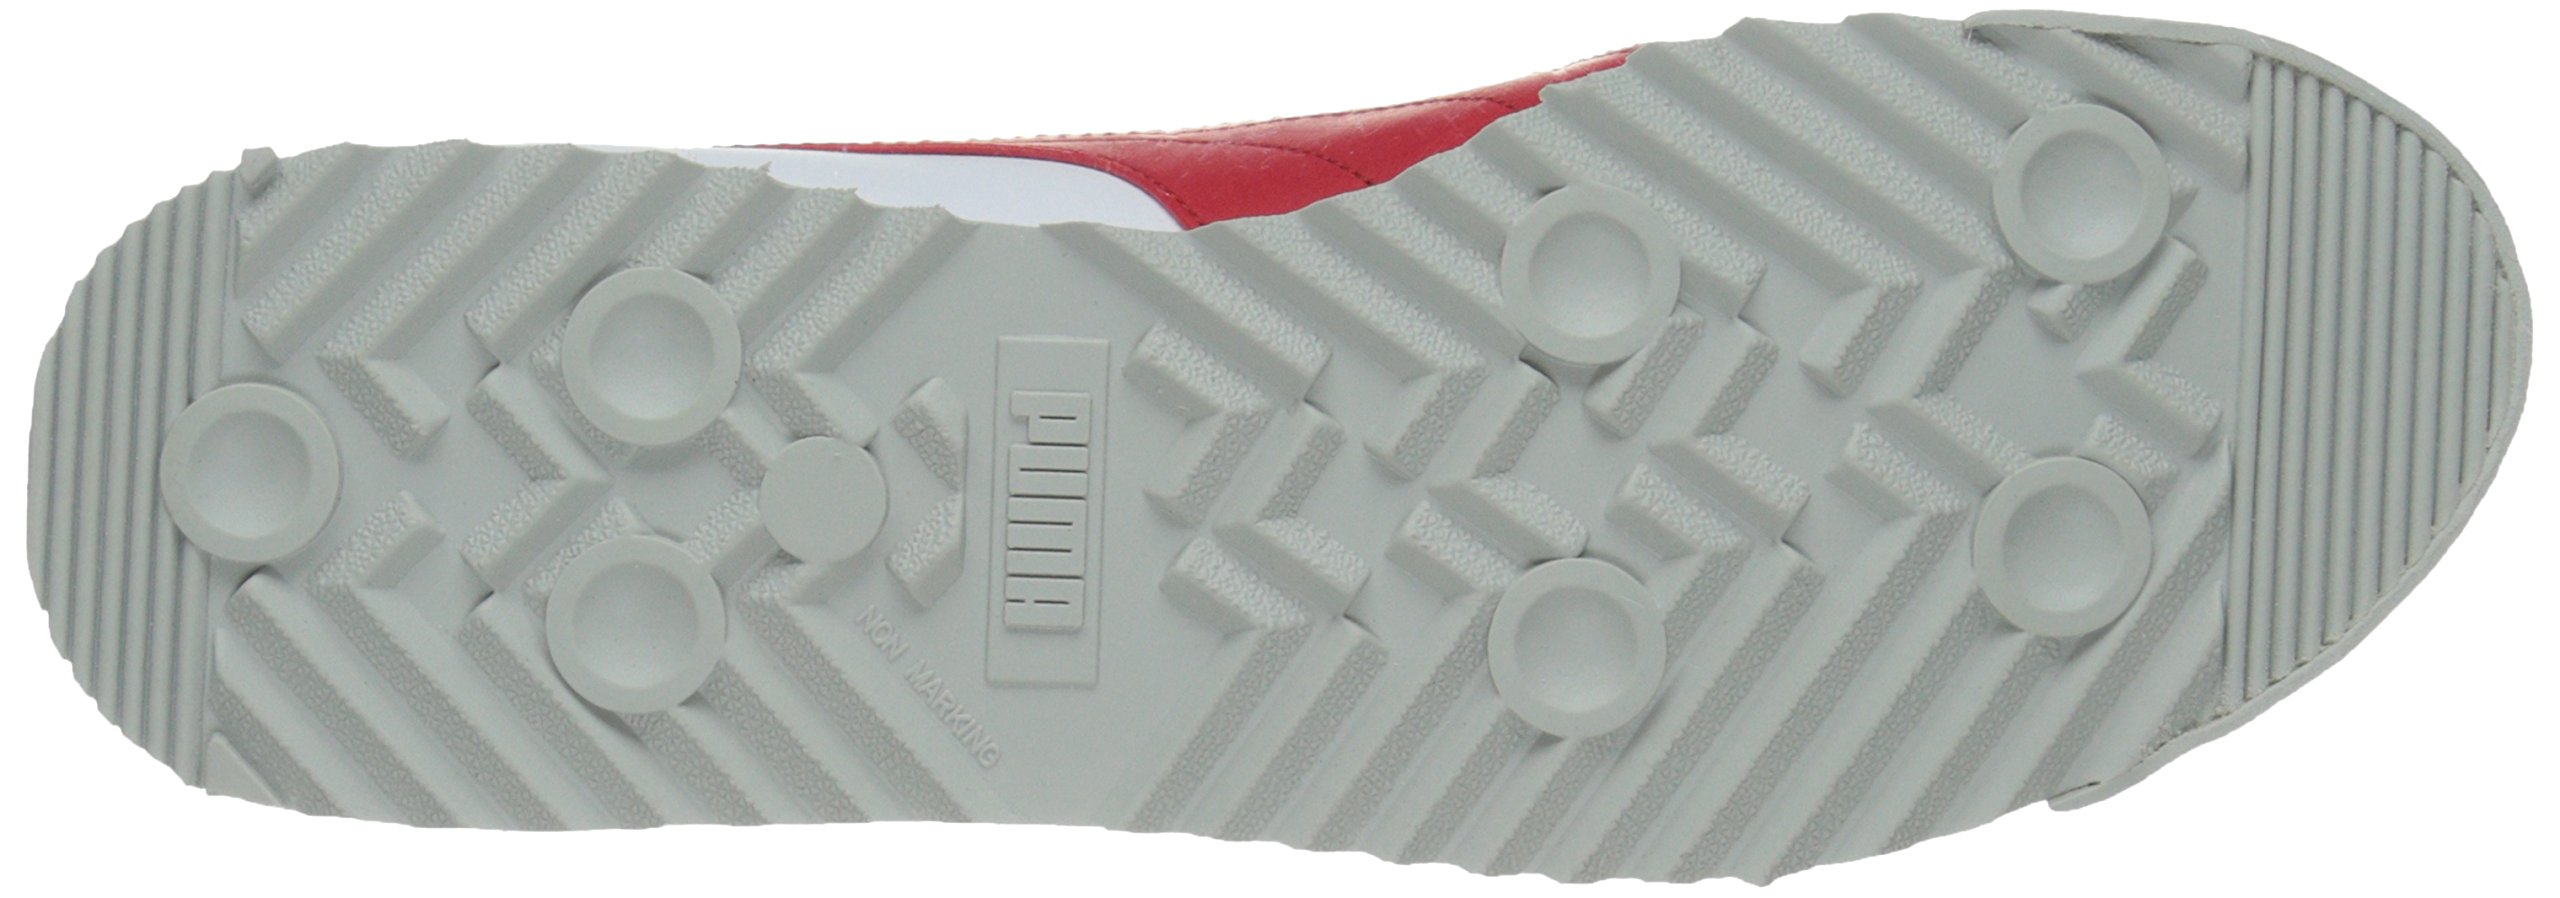 PUMA Men's Roma Basic Fashion Sneaker, White/High Risk Red/White - 9 D(M) US by PUMA (Image #3)